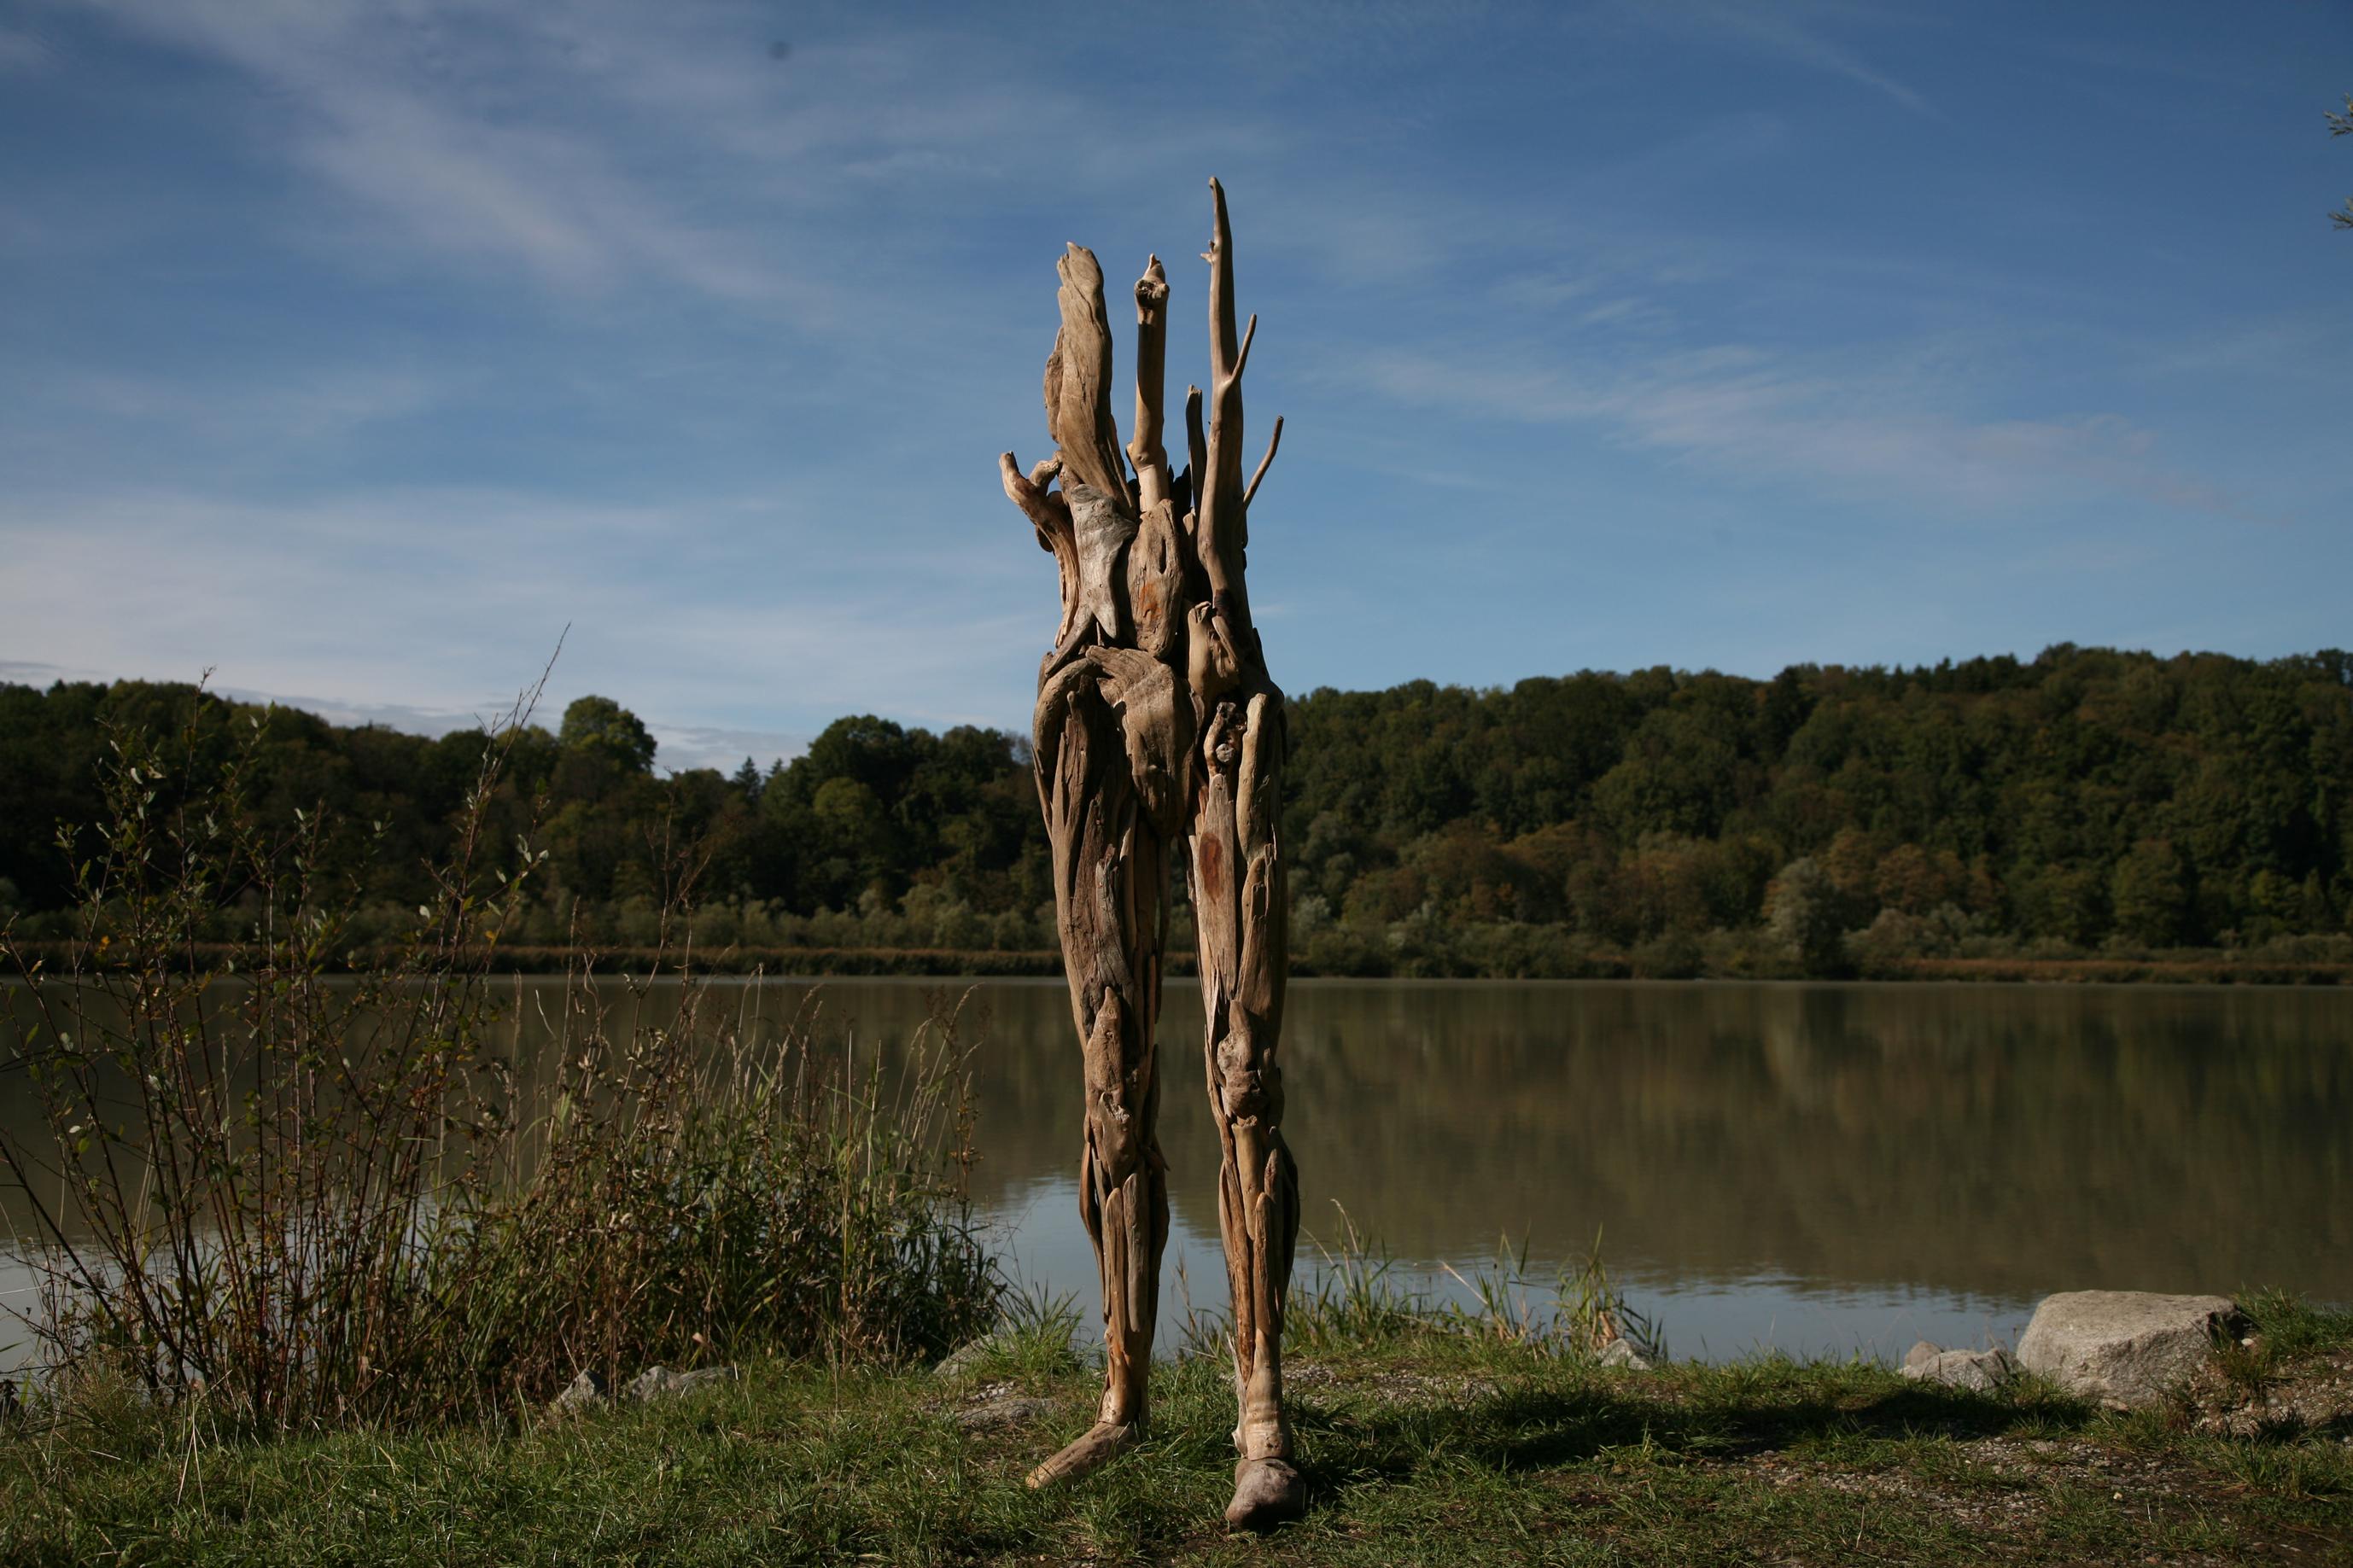 Driftwood Sculptures by Nagato Iwasaki | Spoon & Tamago